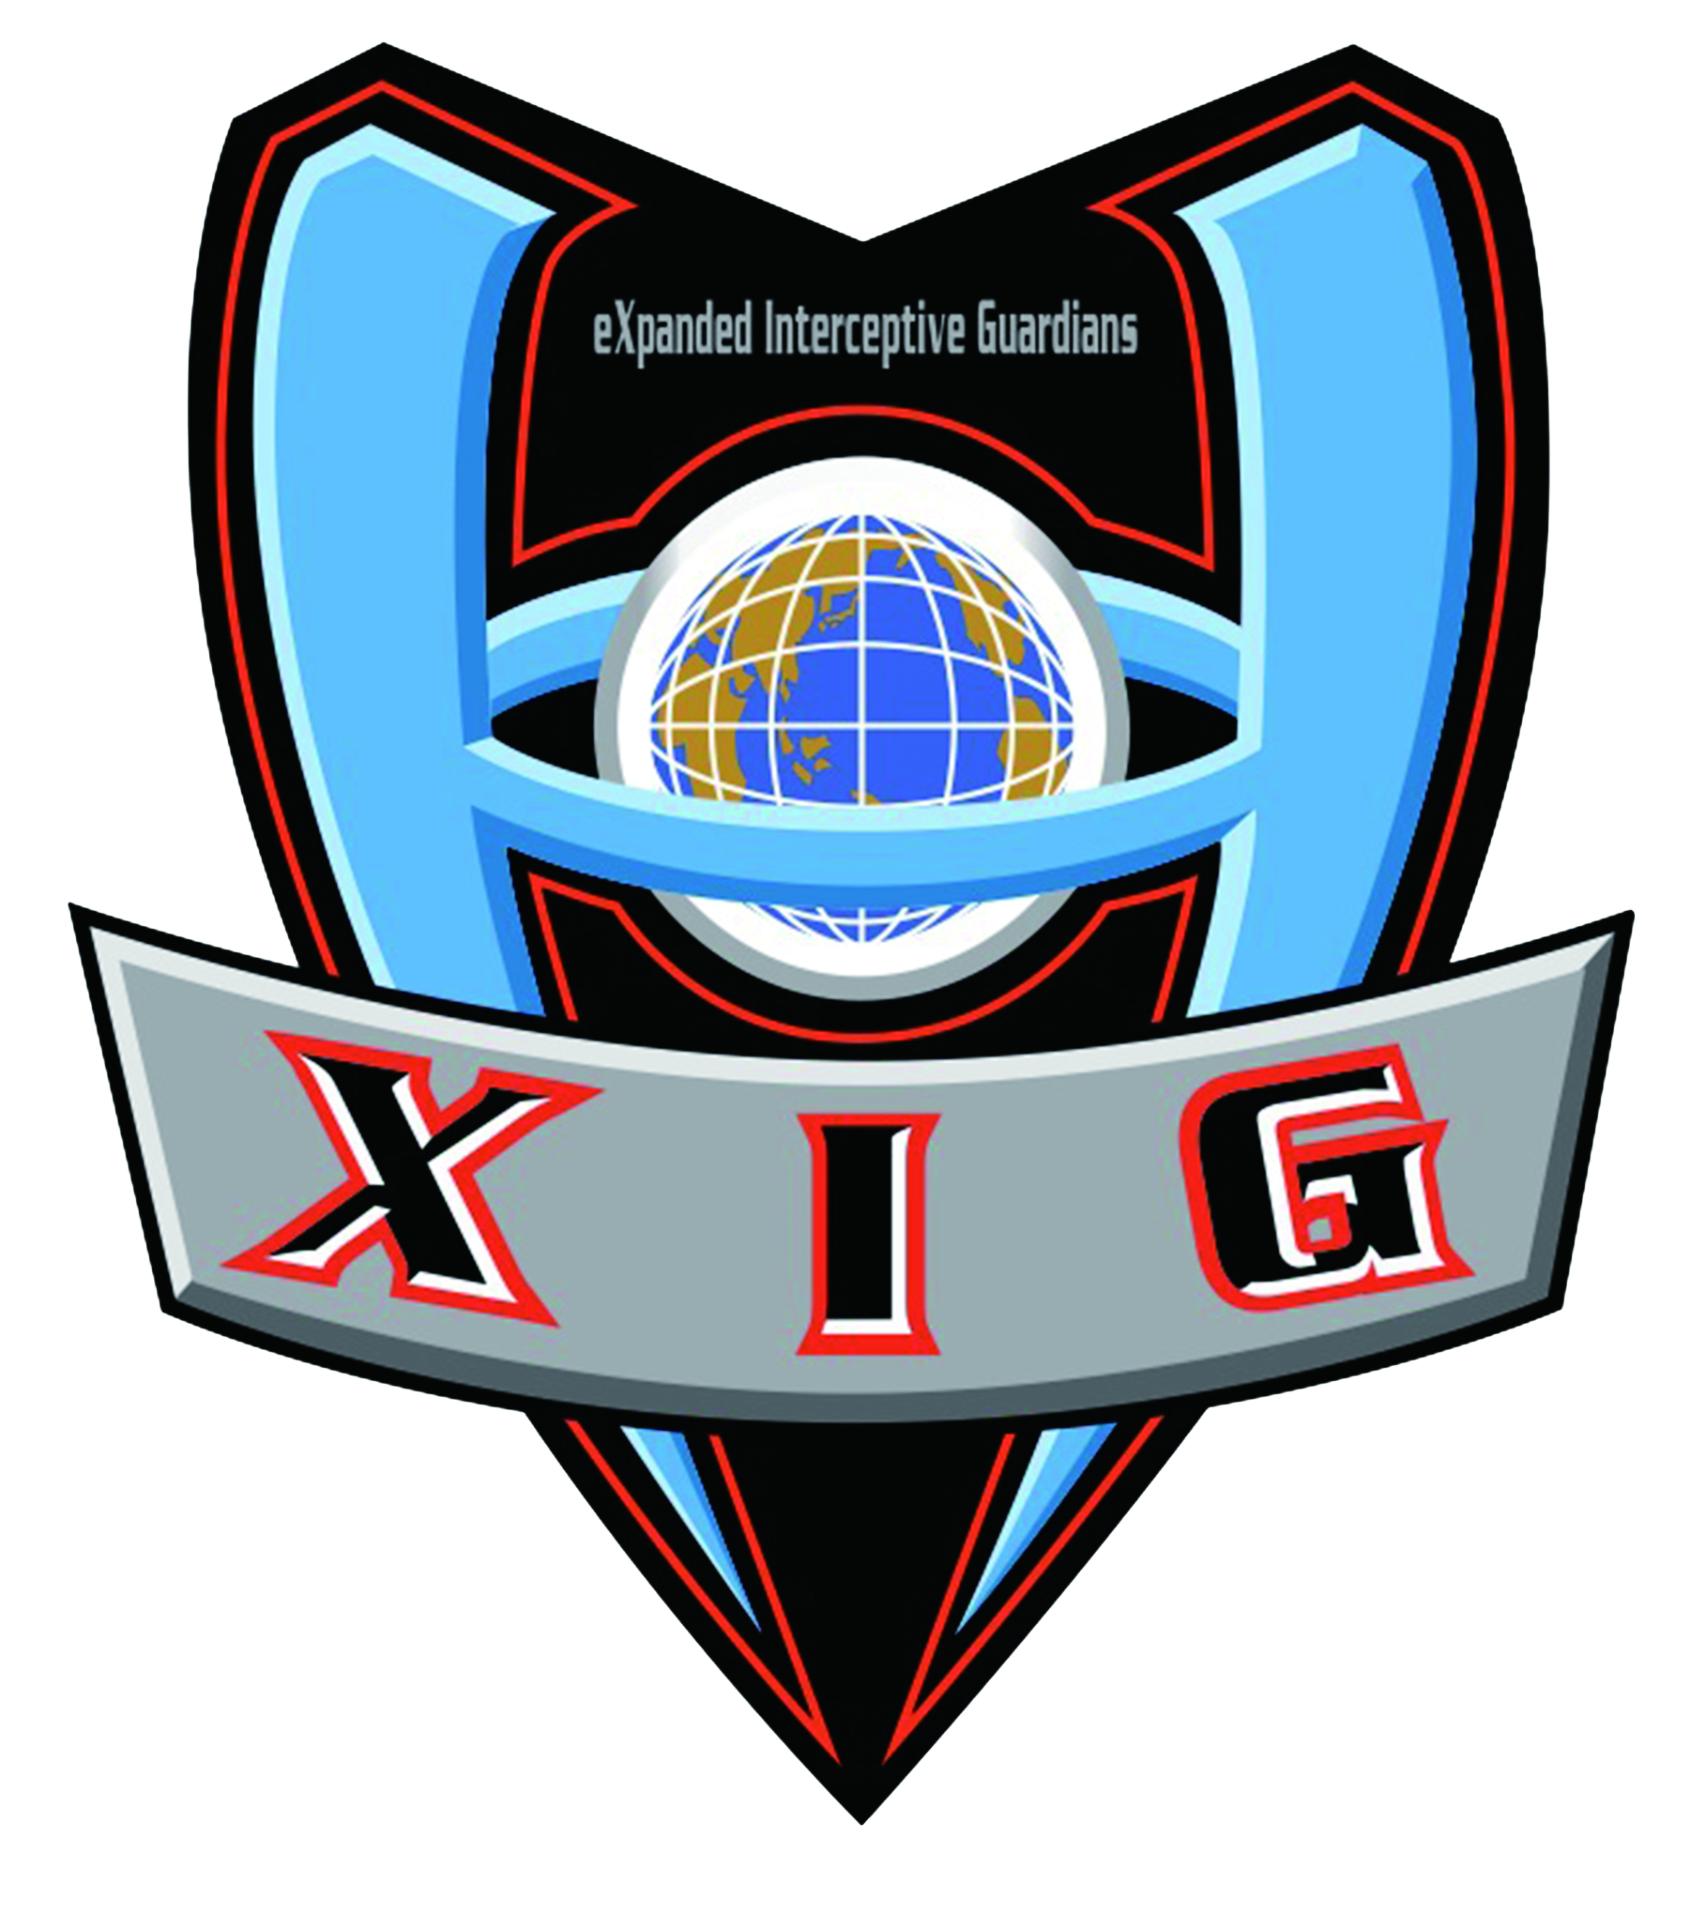 File:Xig logo.jpg